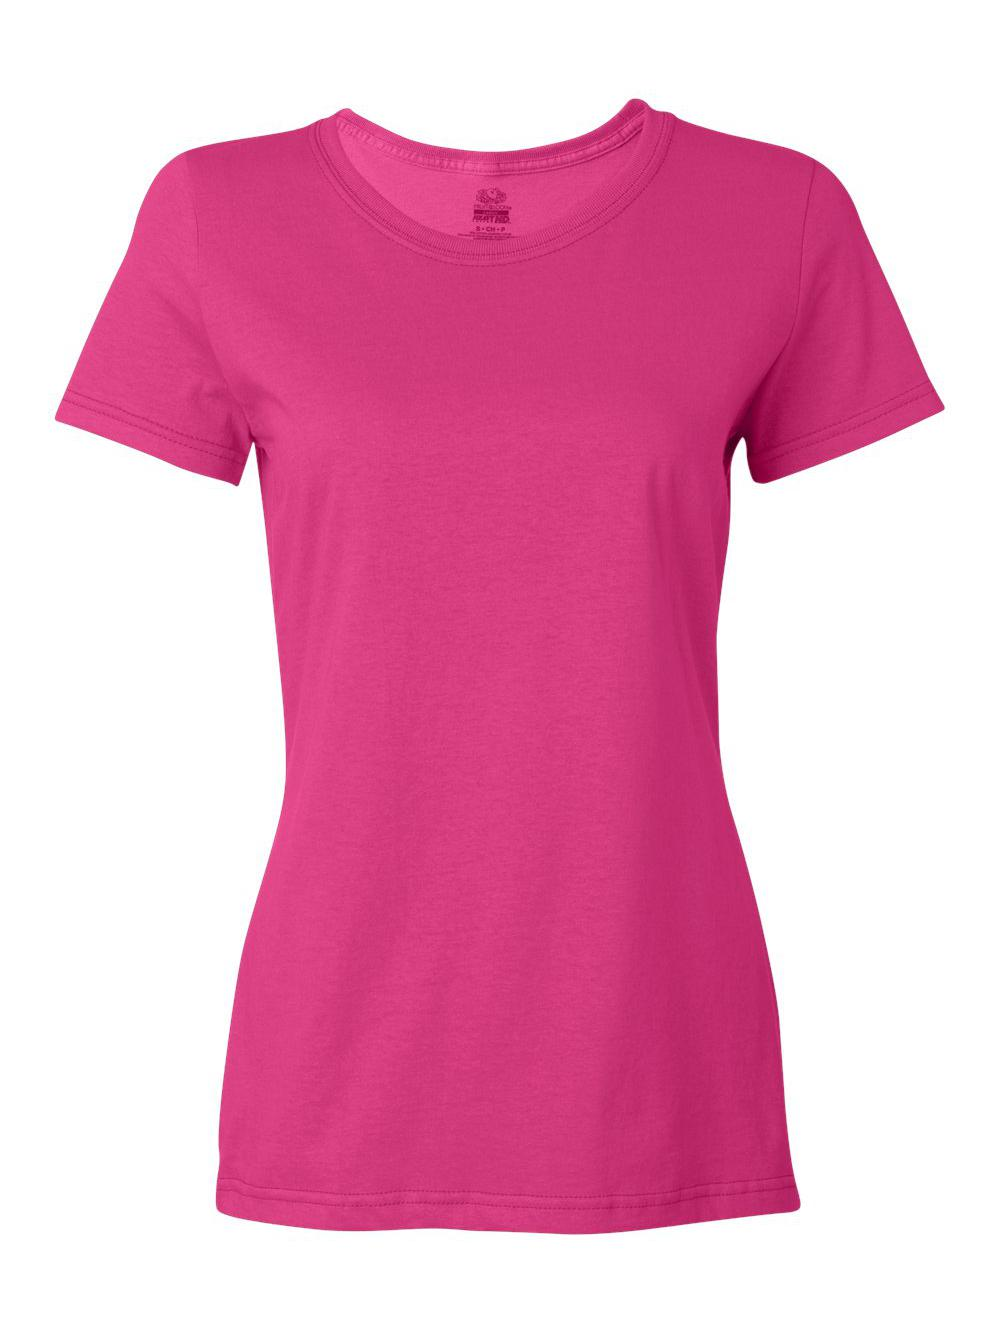 Fruit-of-the-Loom-HD-Cotton-Women-039-s-Short-Sleeve-T-Shirt-L3930R thumbnail 12